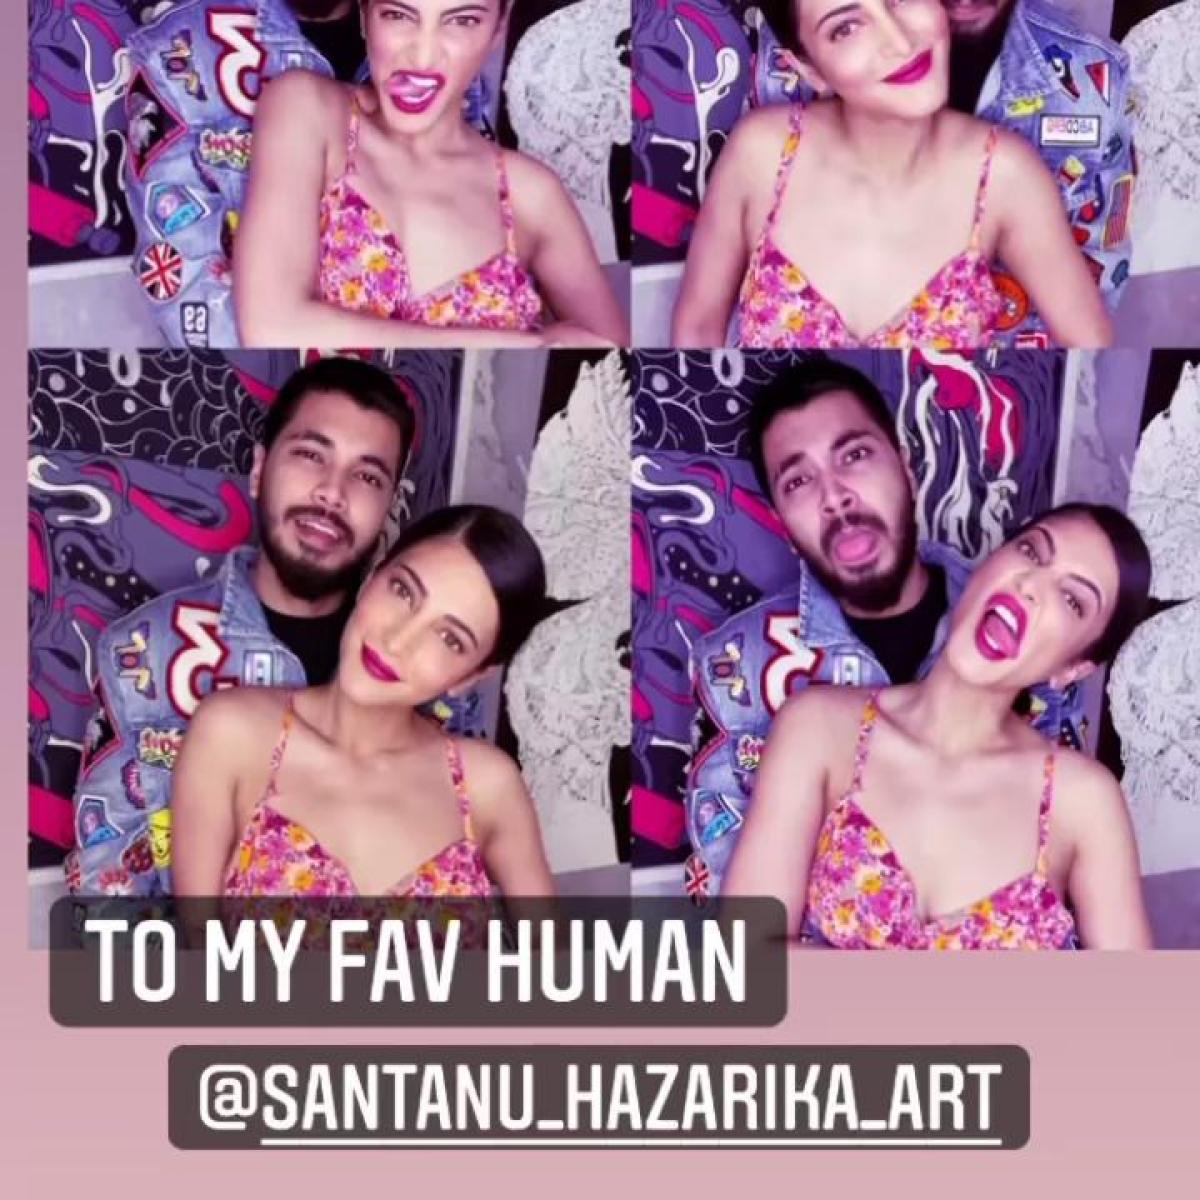 Shruti Haasan shares unseen pics with boyfriend Santanu Hazarika on his birthday, calls him 'fav human'